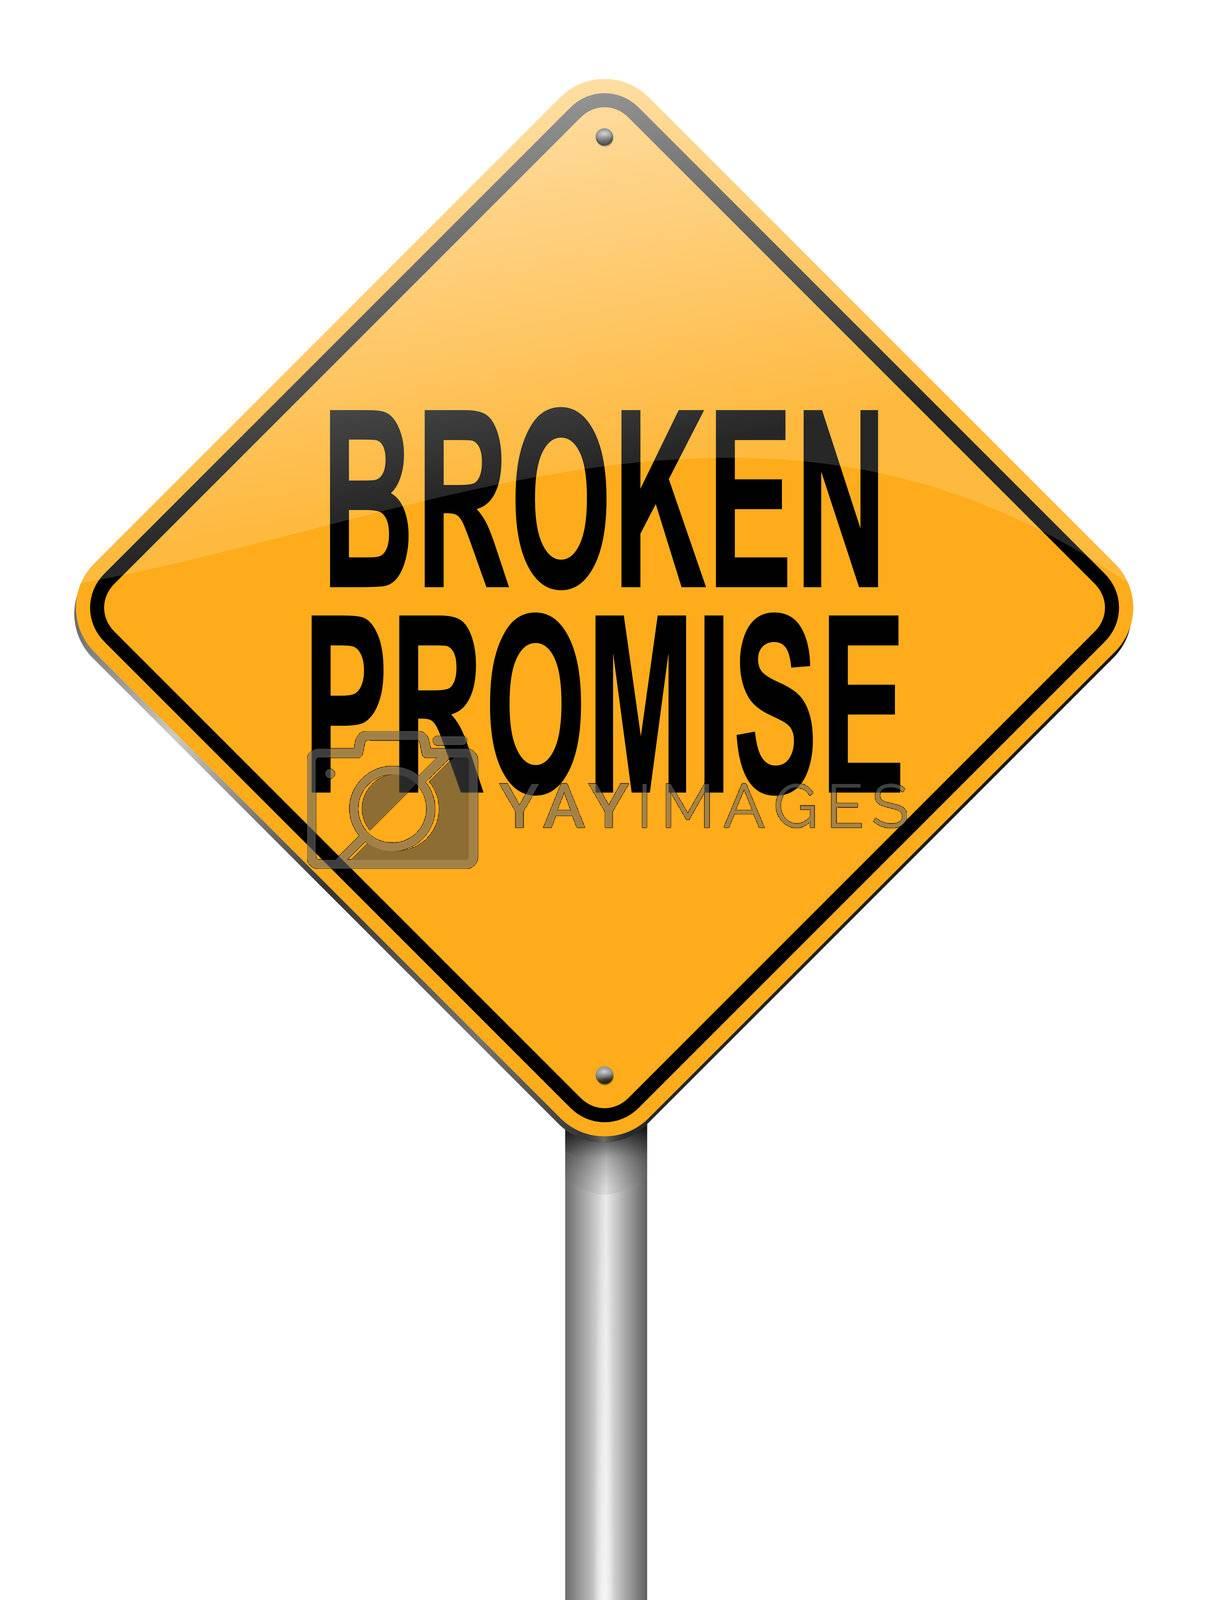 Broken promise concept. by 72soul